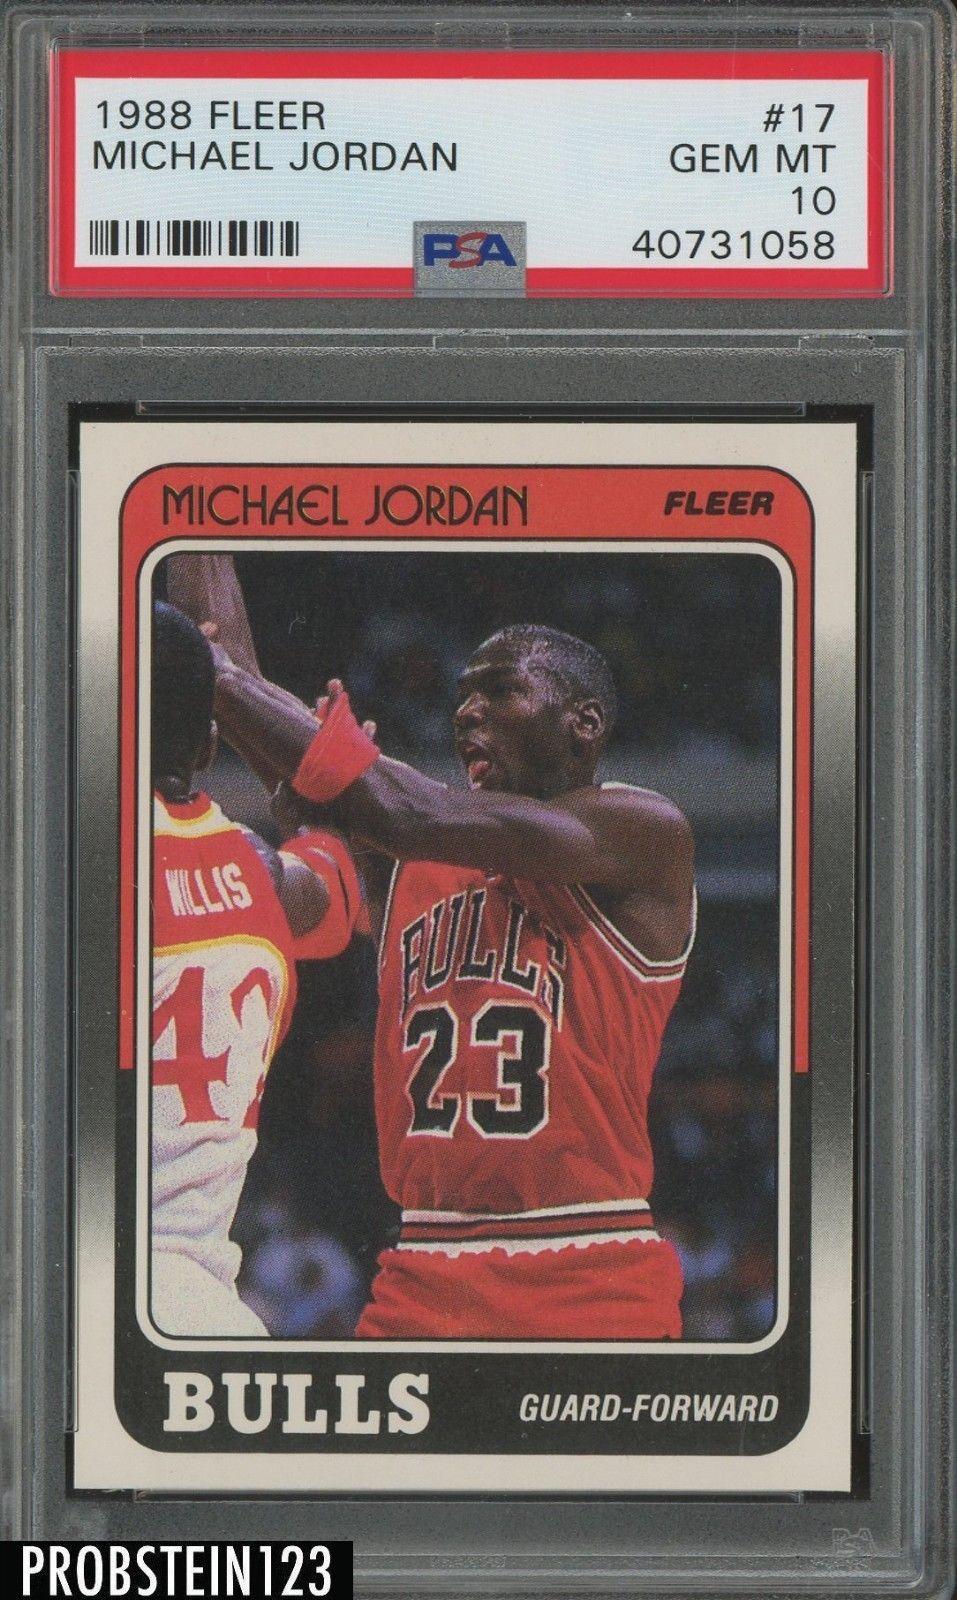 1988 fleer basketball 17 michael jordan hof psa 10